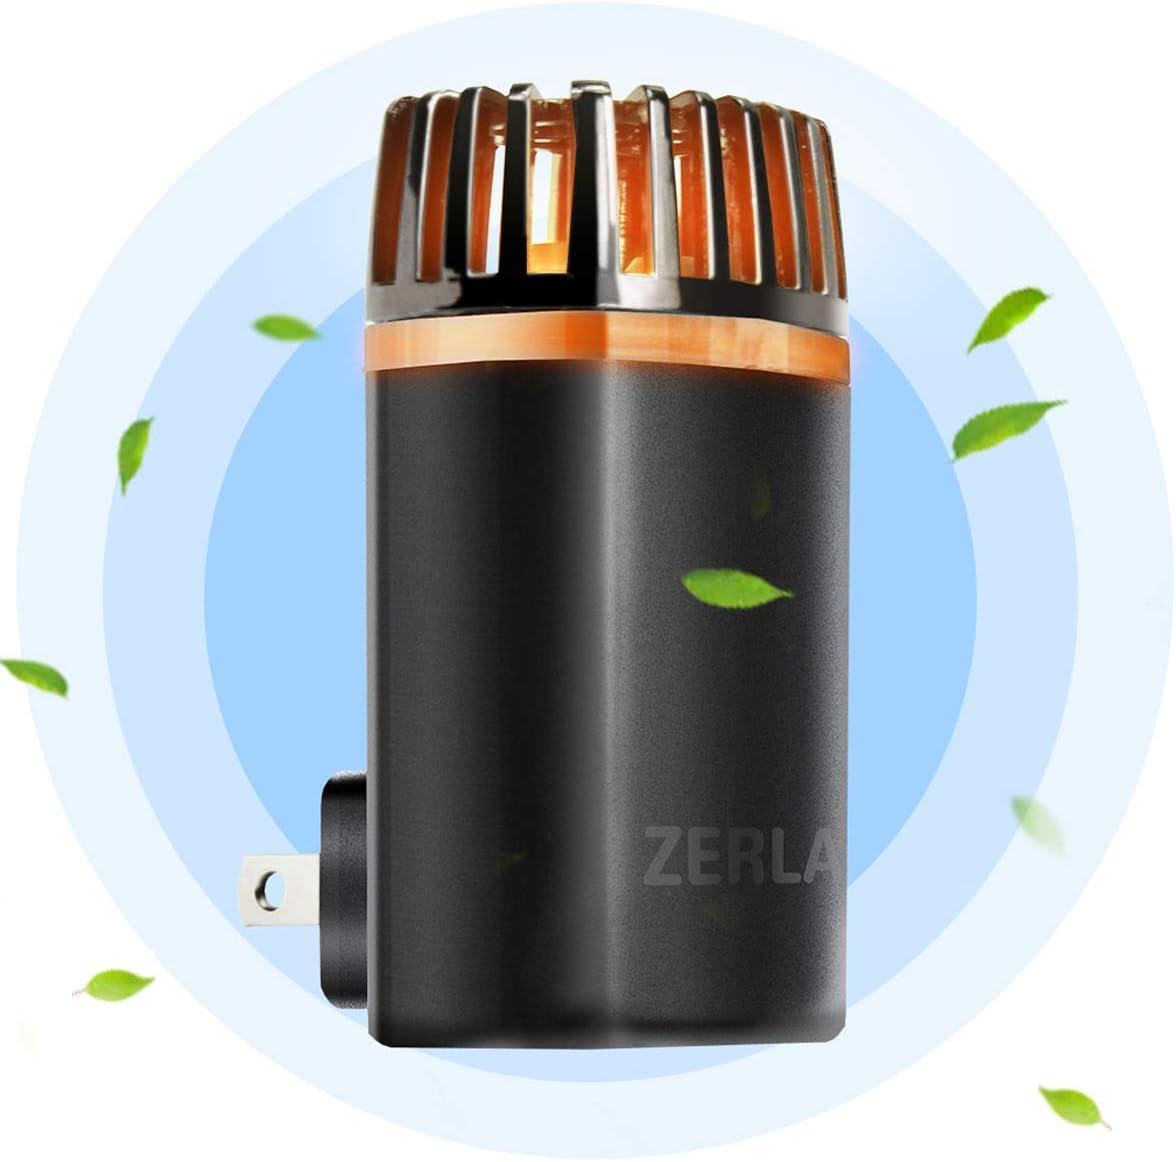 ZERLA Air Purifier for Home,Pluggable Mini Smoke Purifier Odor Eliminator